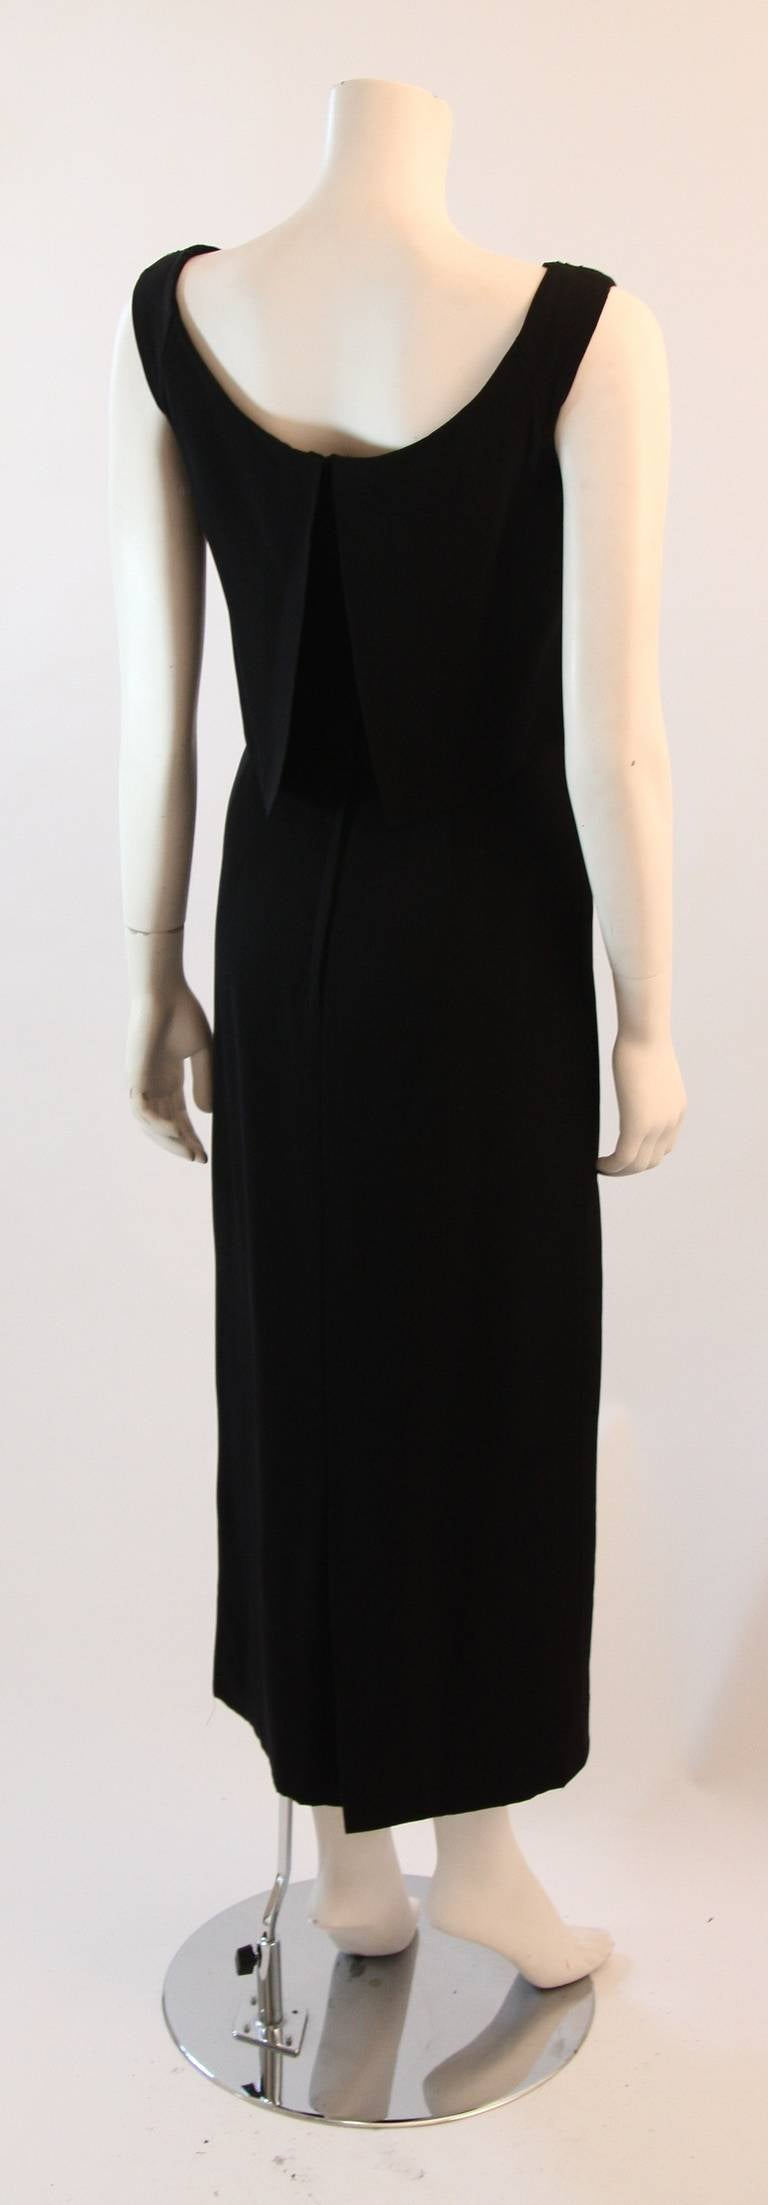 Dorothy O'Hara Black Silk Crepe Gown with Drape front split back design 7